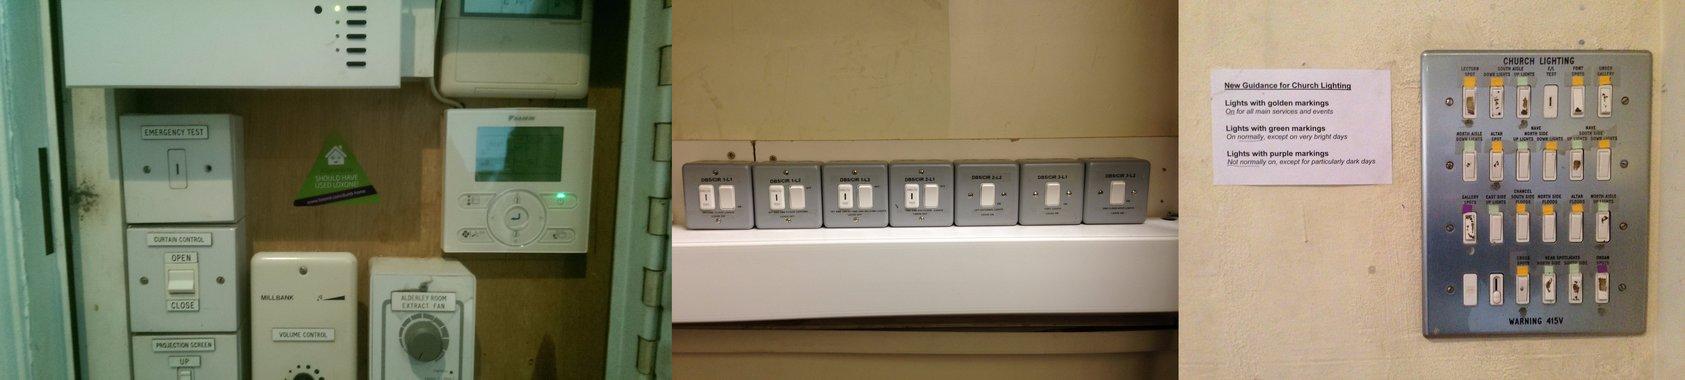 switches-slider2